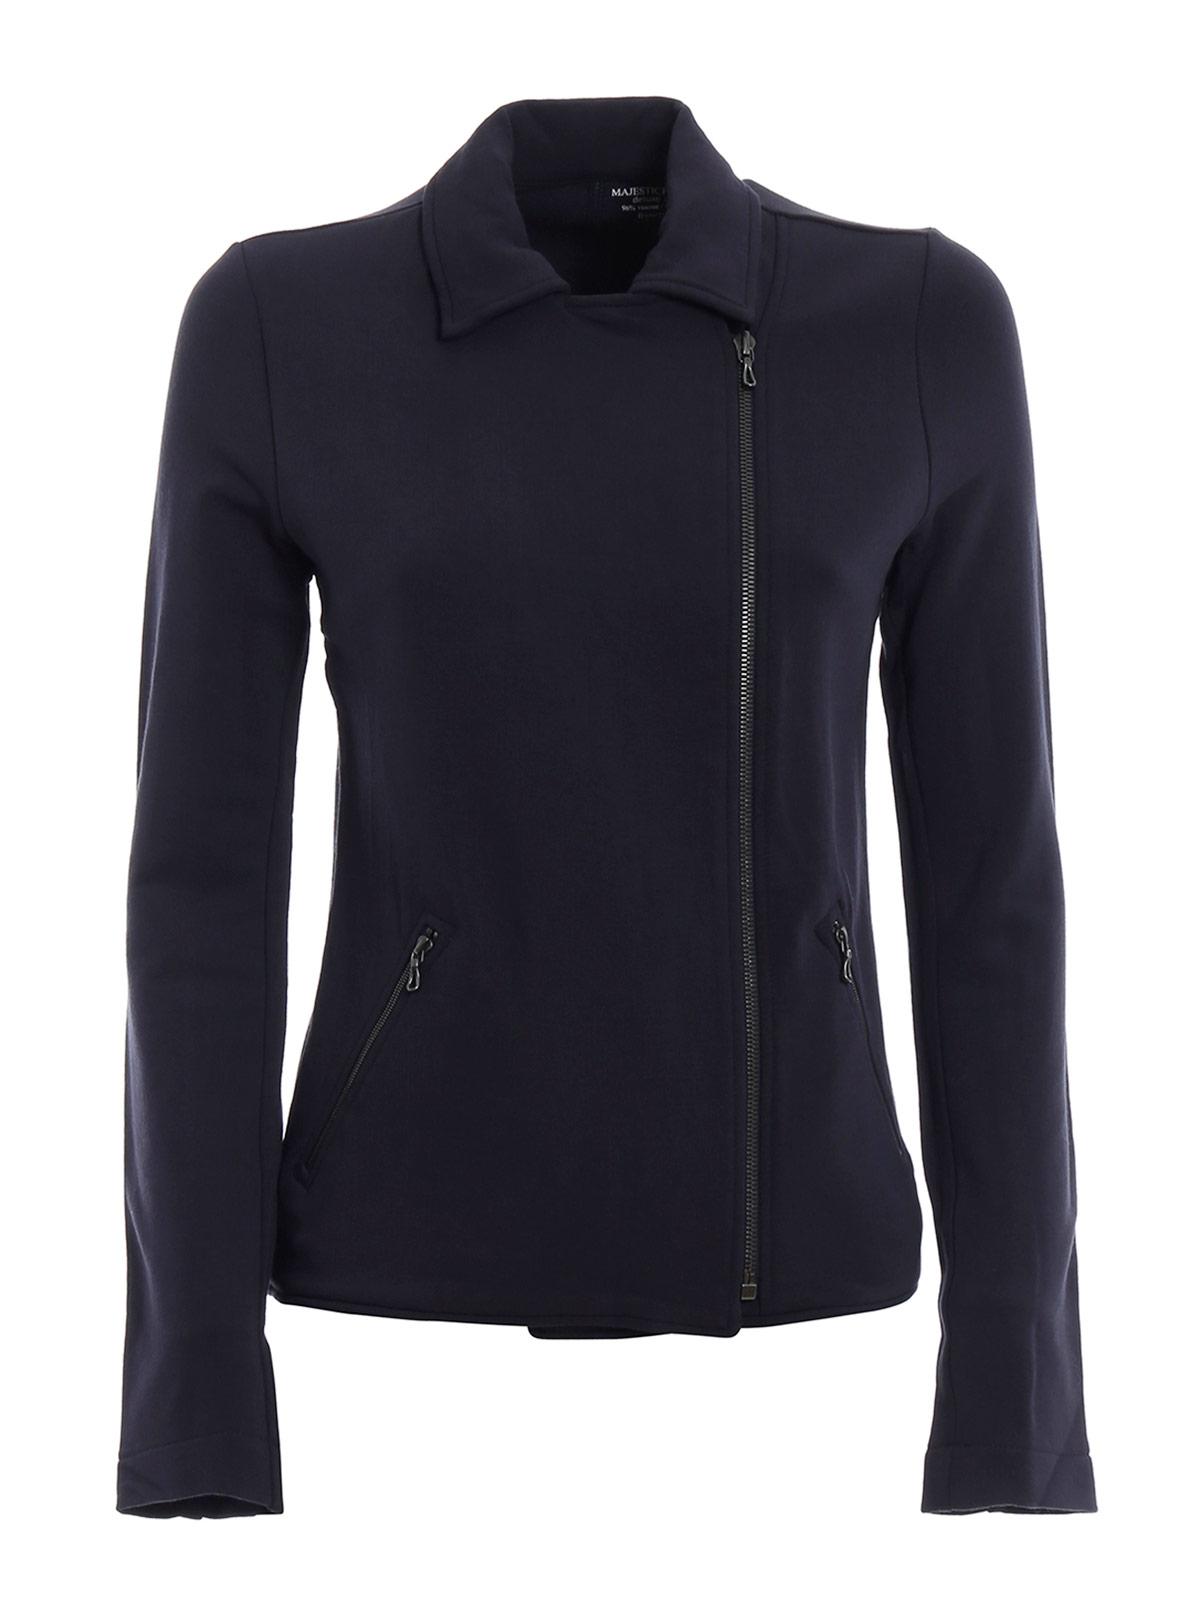 Picture of MAJESTIC FILATURES | Women's Asymmetric Zip Jacket